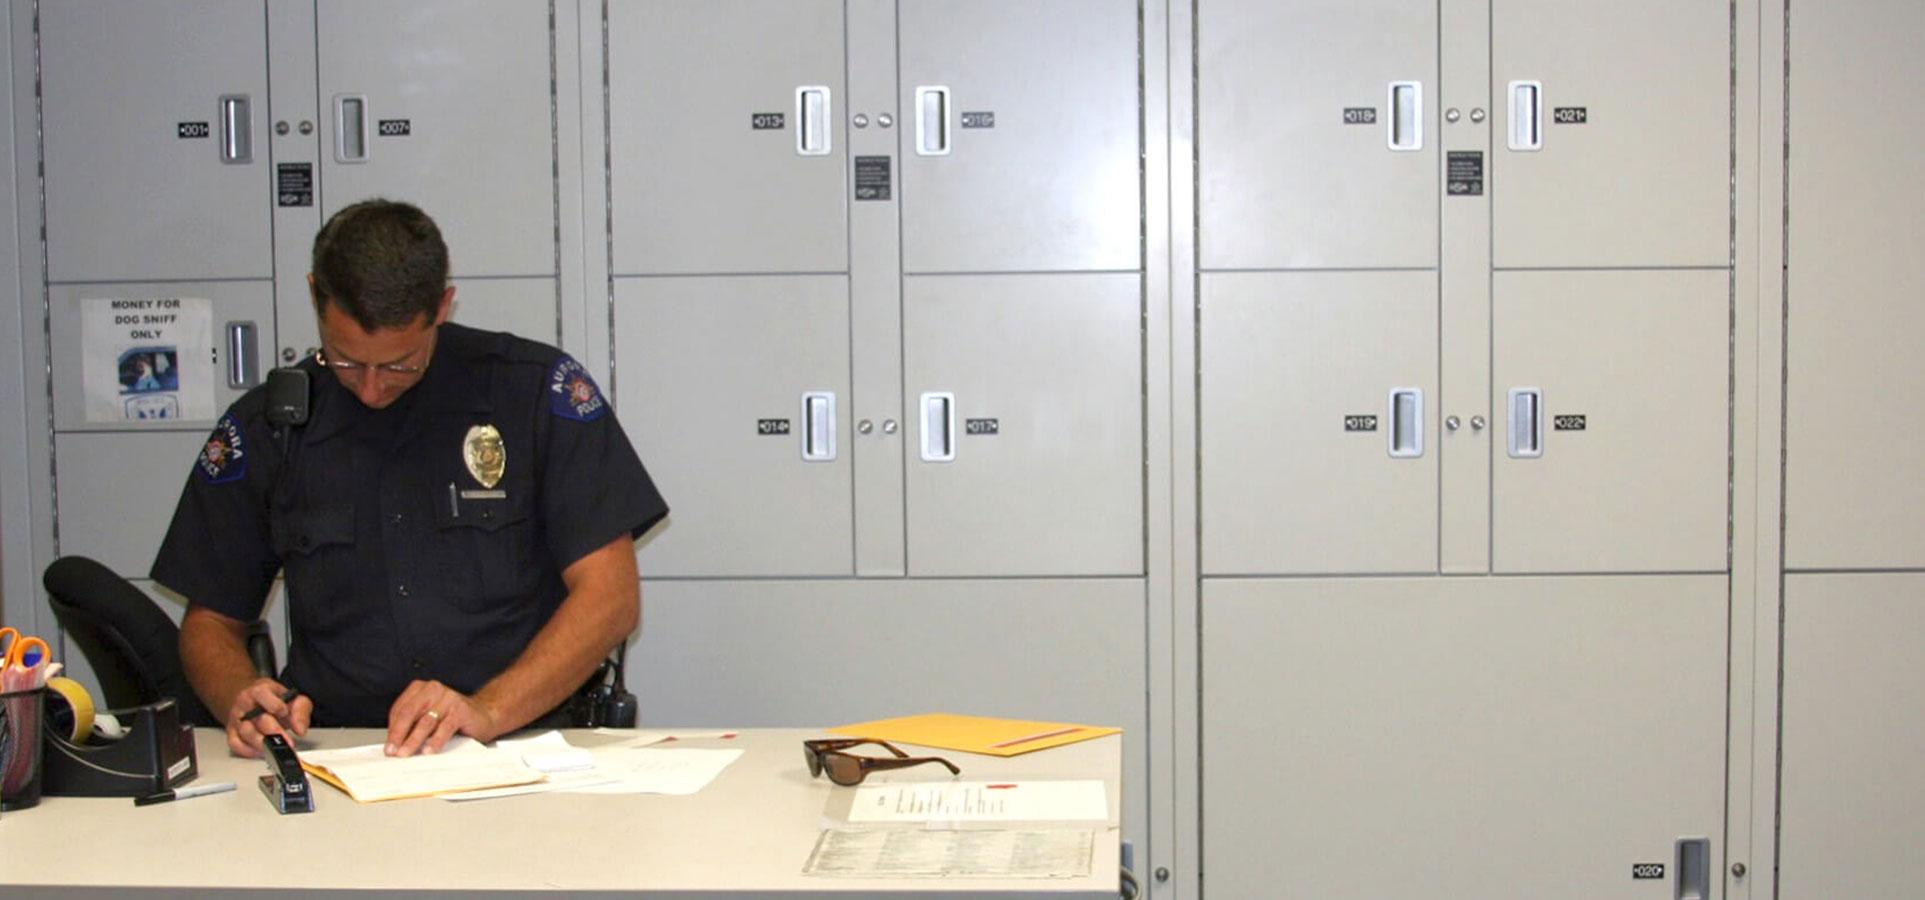 evidence locker room chain of custody